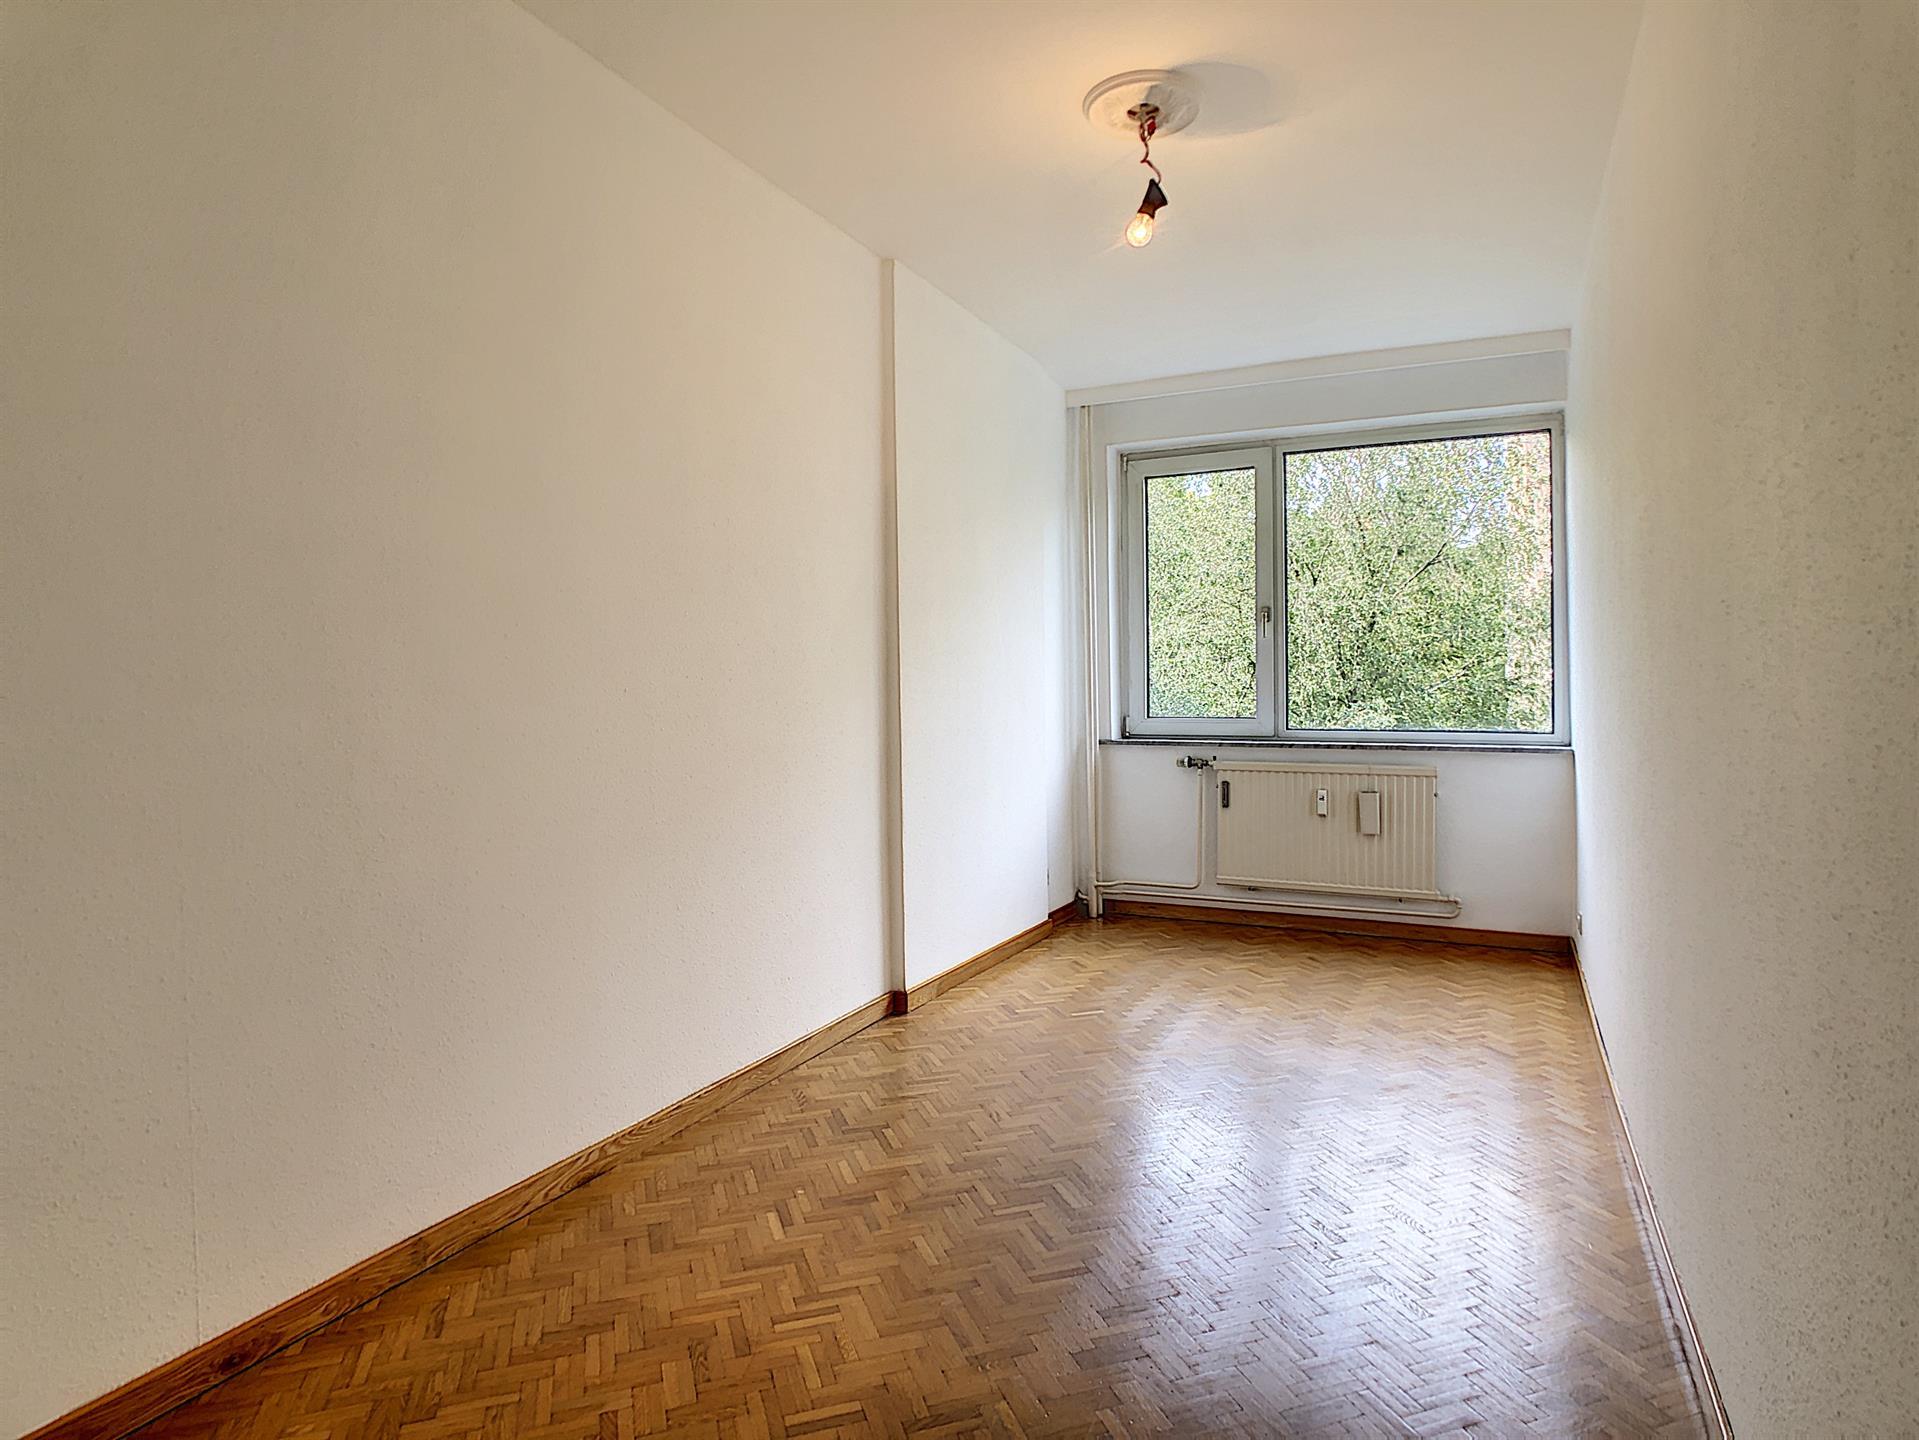 Appartement - Jette - #4117916-2